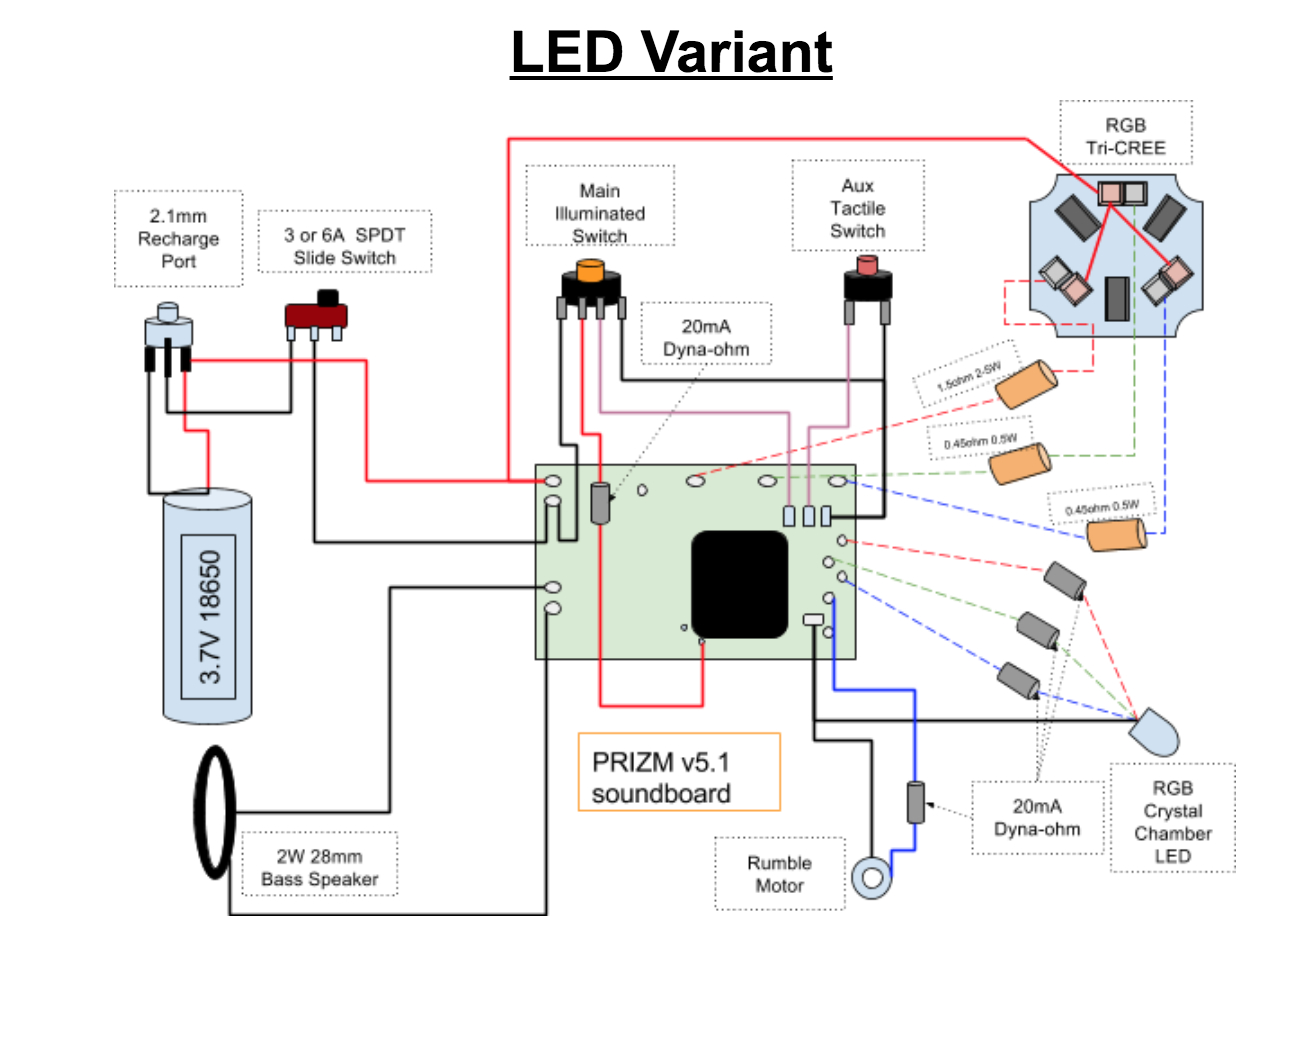 Lightsaber Wiring Diagram | Wiring Library - Nano Biscotte V4 Wiring Diagram